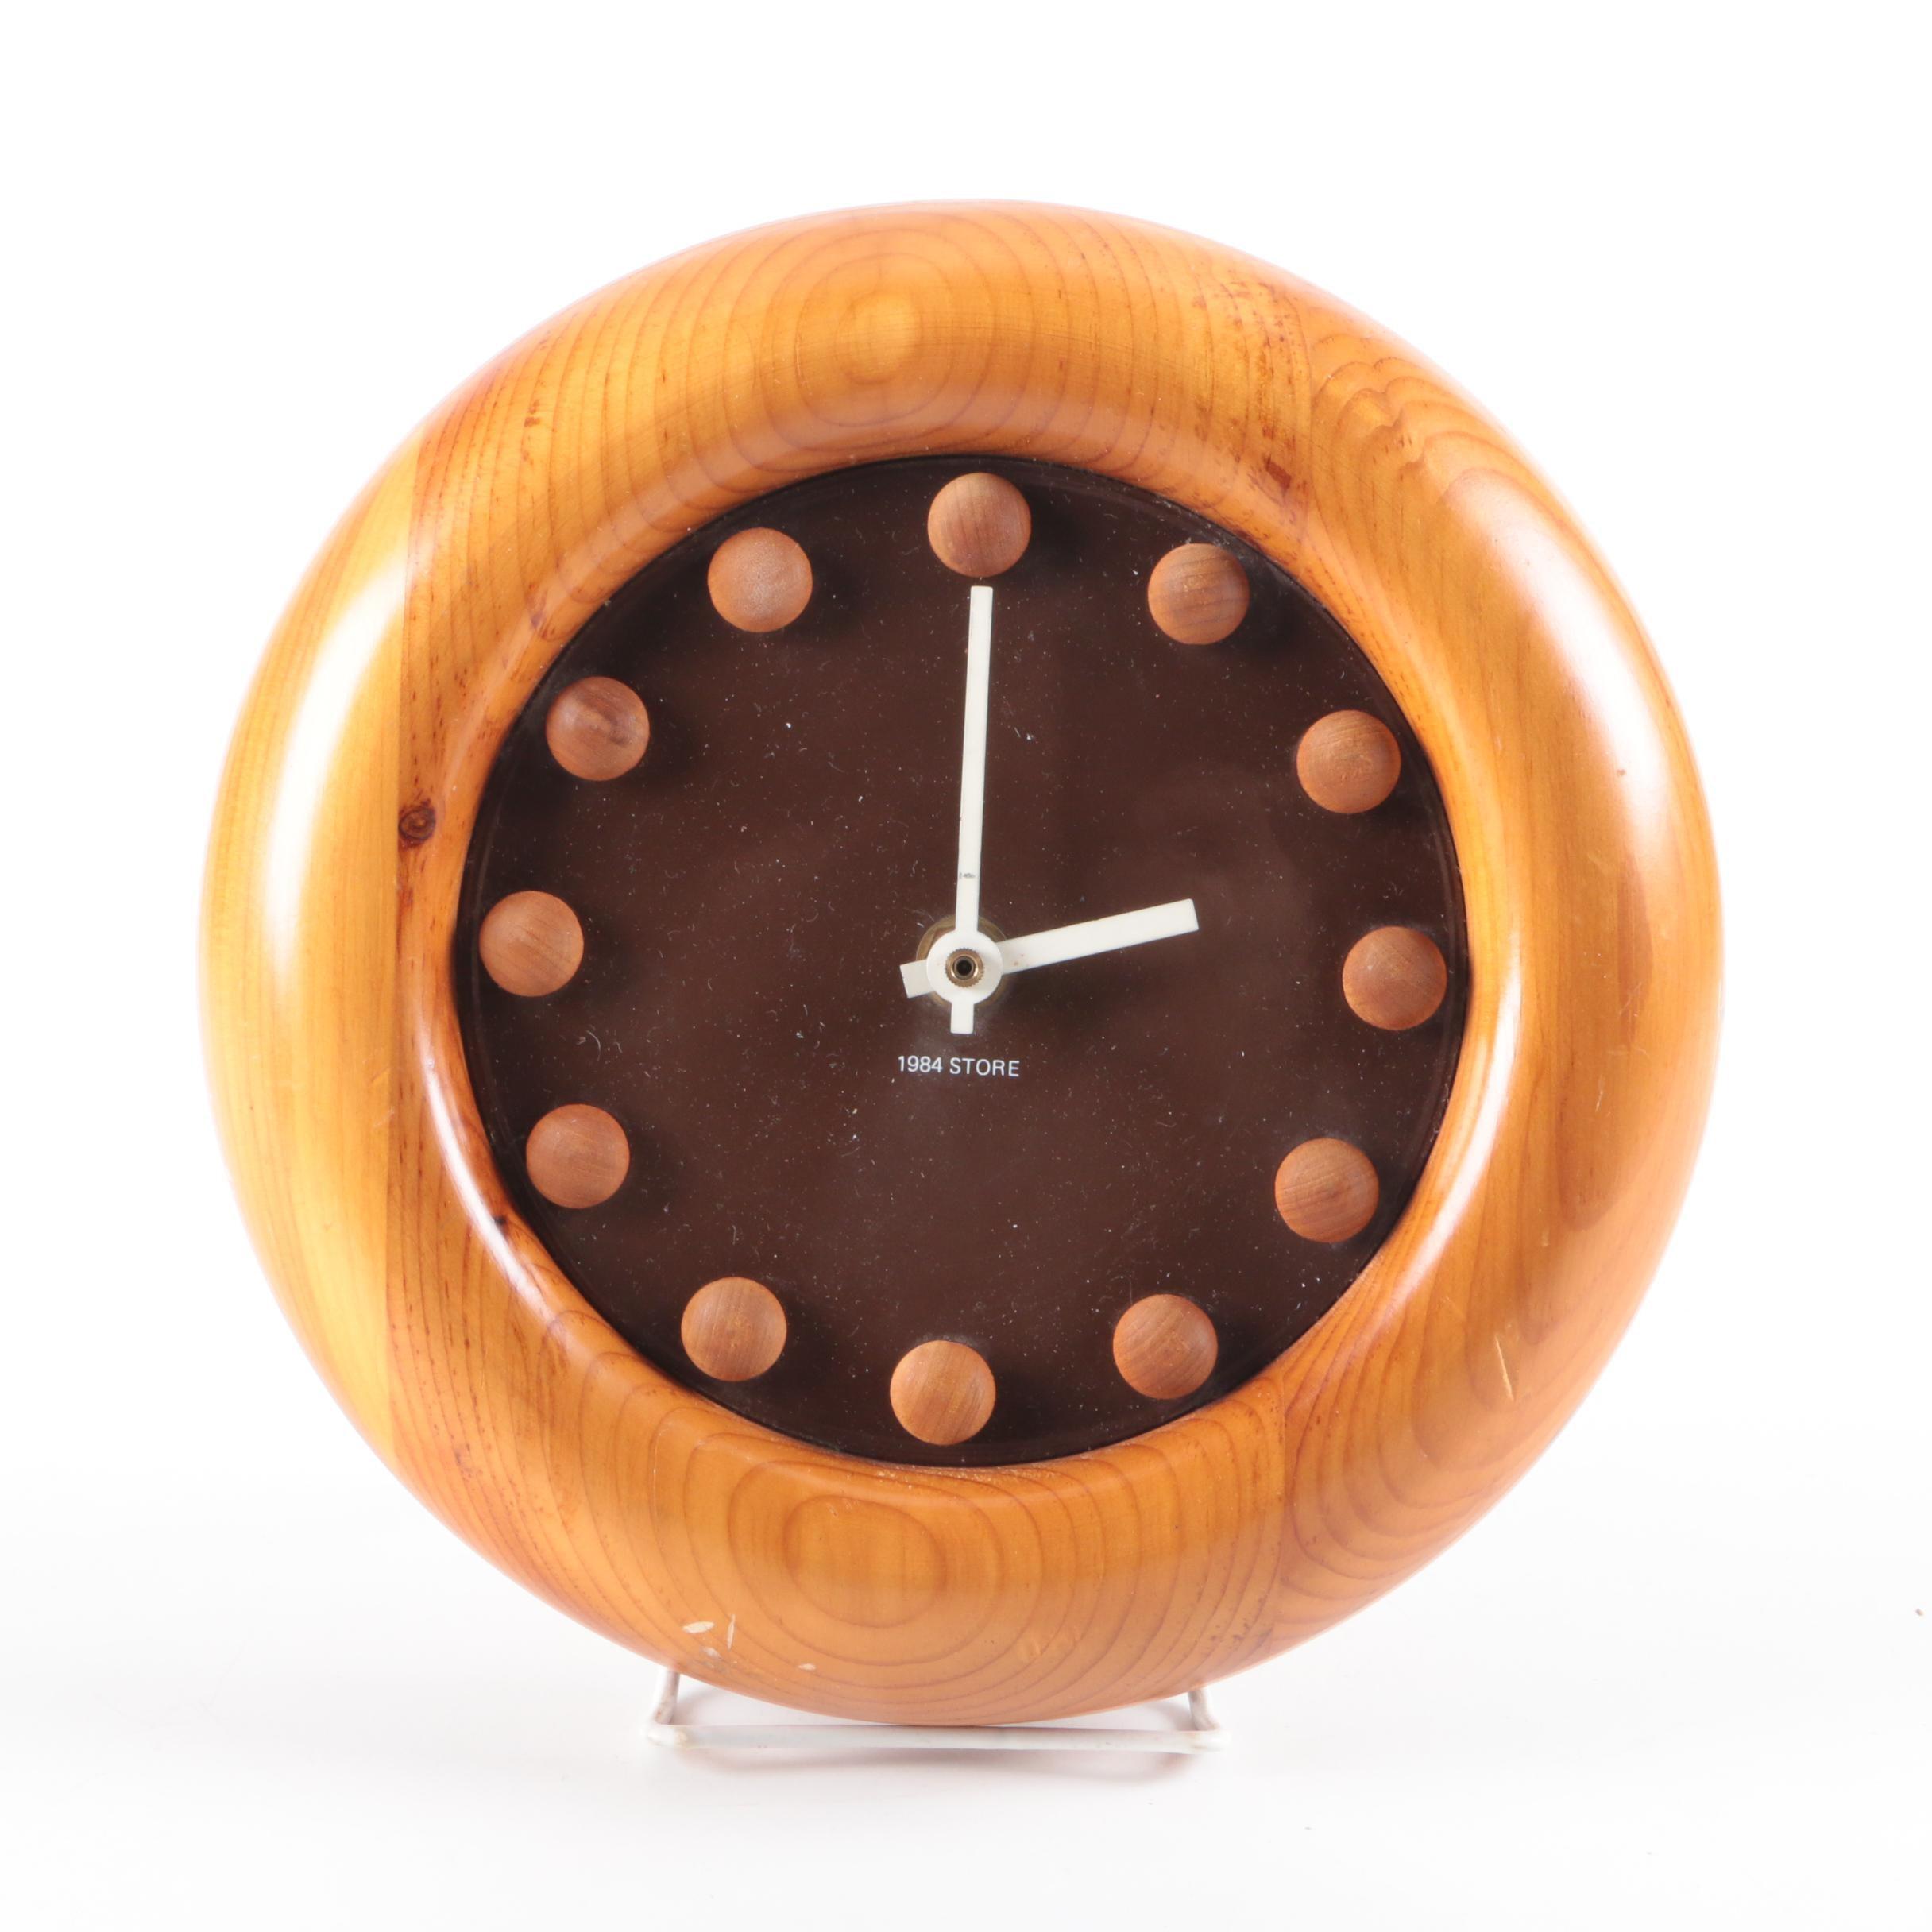 Mid Century Modern 1984 Store Round Wood Wall Clock